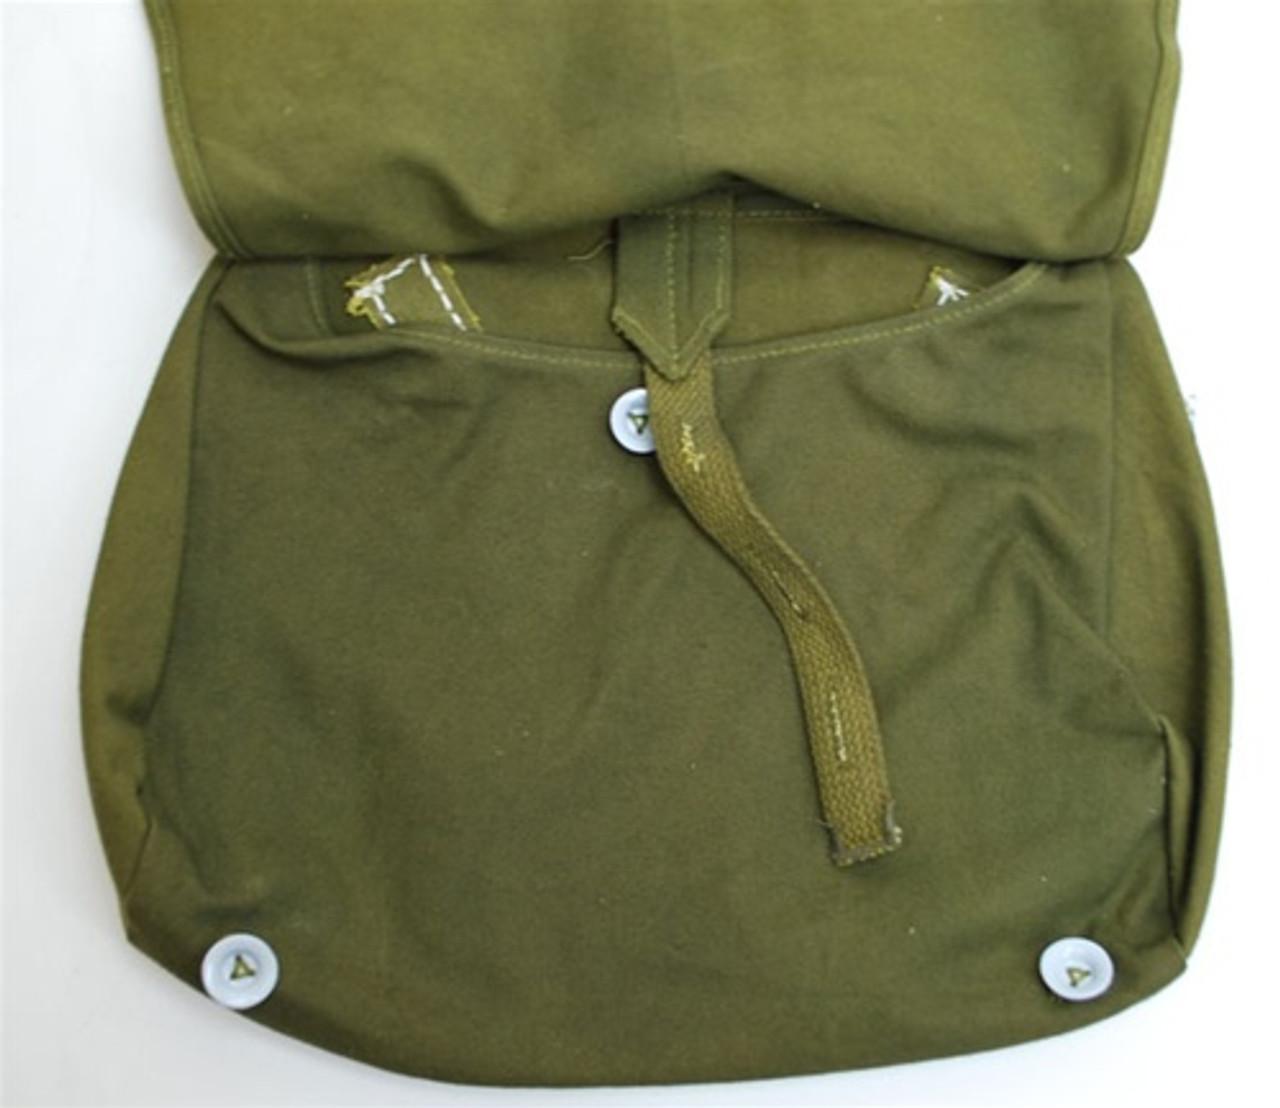 M41 Bread Bag from Hessen Antique